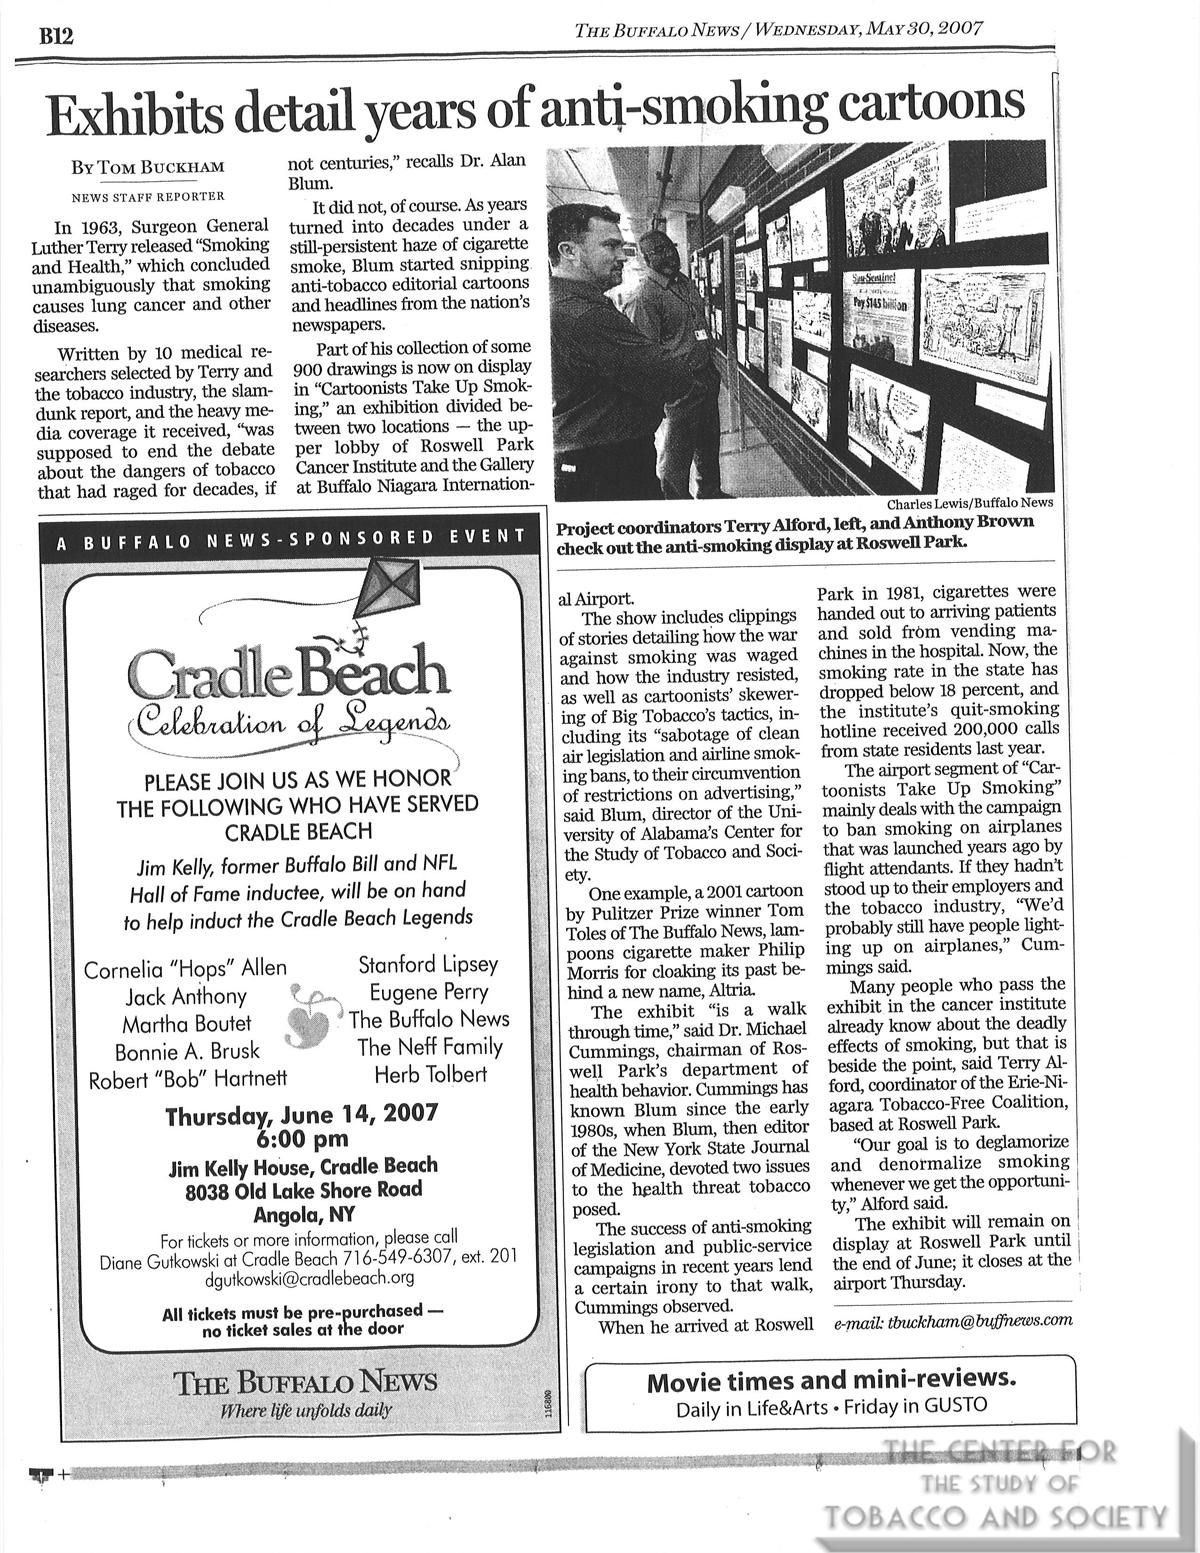 2007 05 30 The Buffalo News Exhibits detail years of anti smoking cartoons